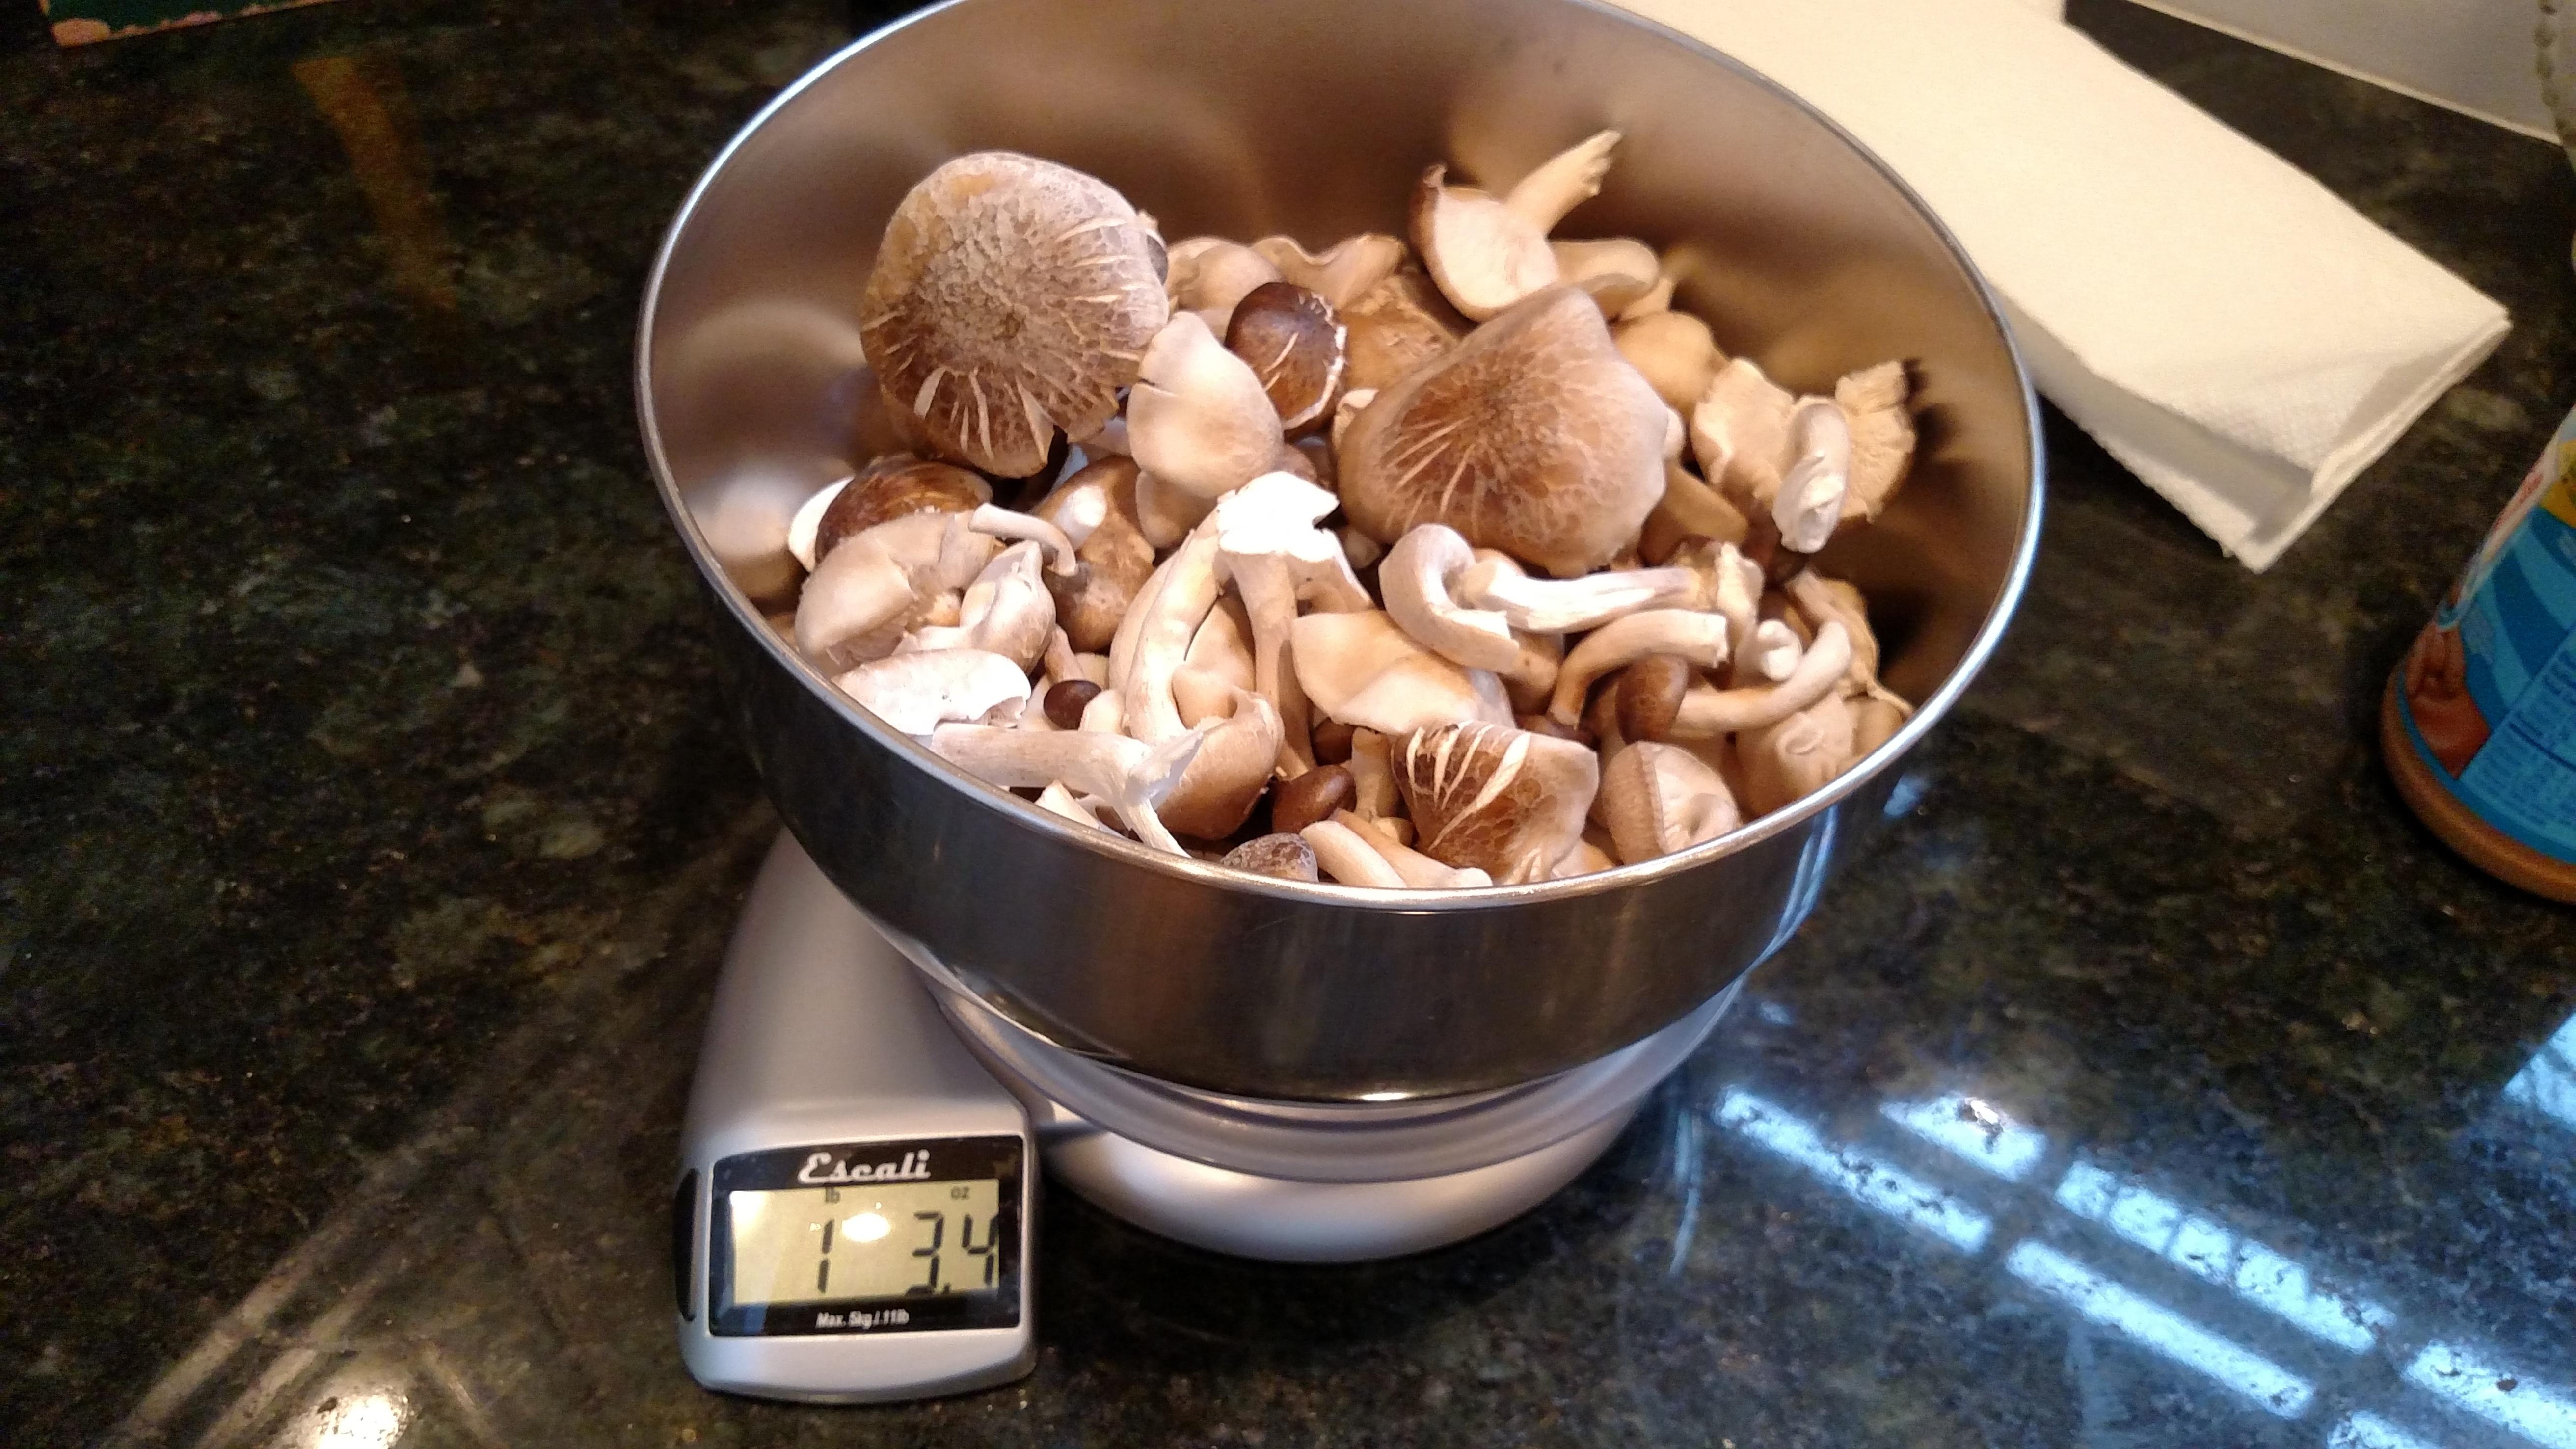 Random edible grow photo thread - Gourmet and Medicinal Mushrooms